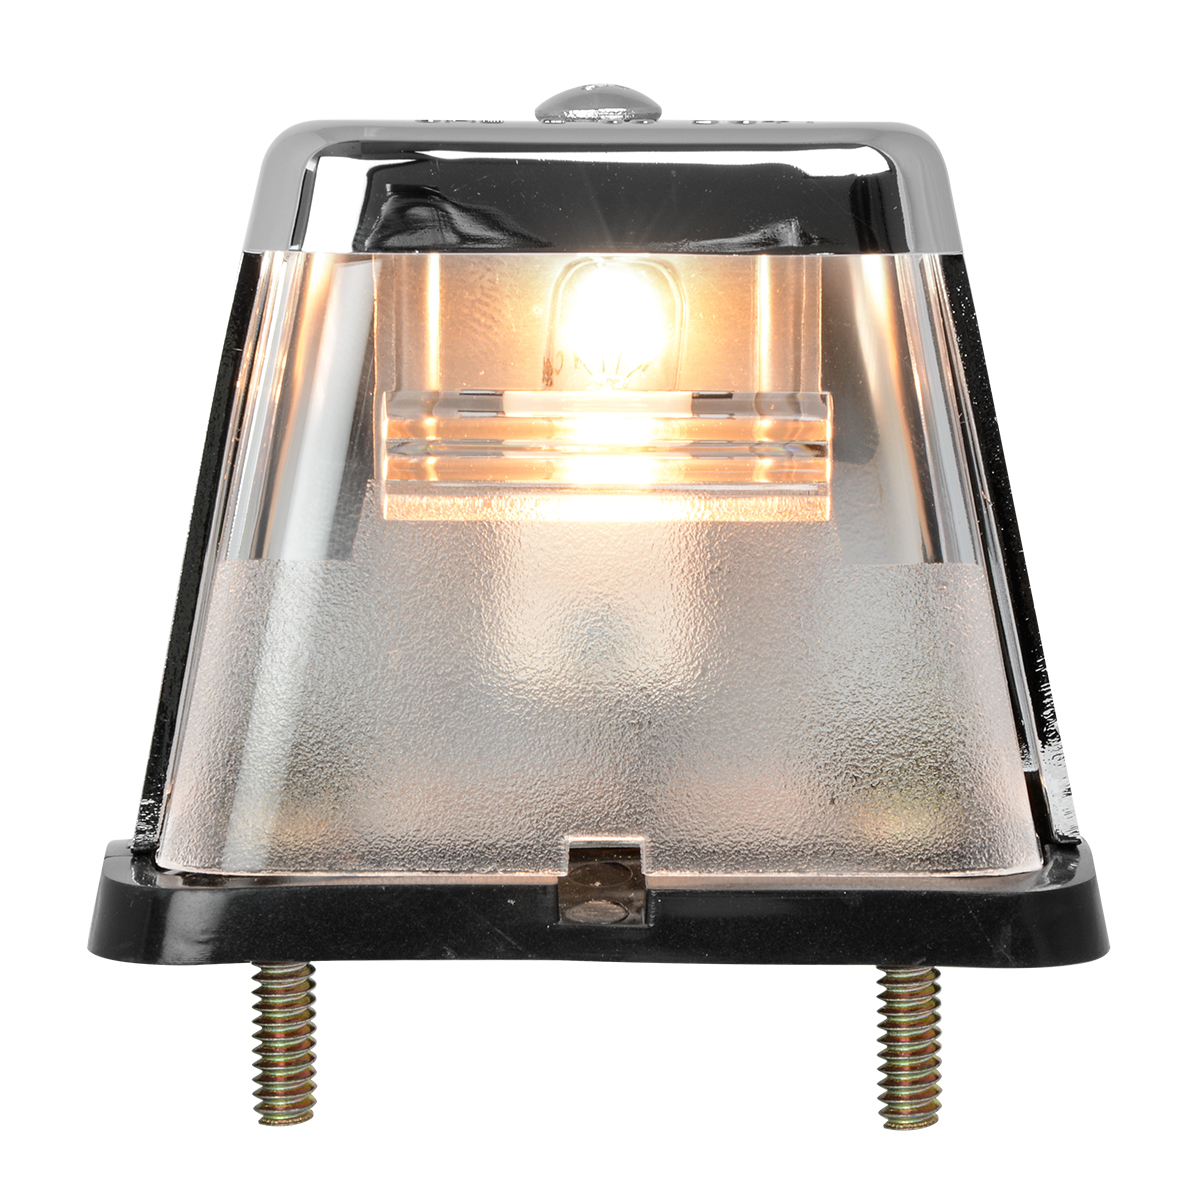 #80570 Stud Mount Square License Plate Light